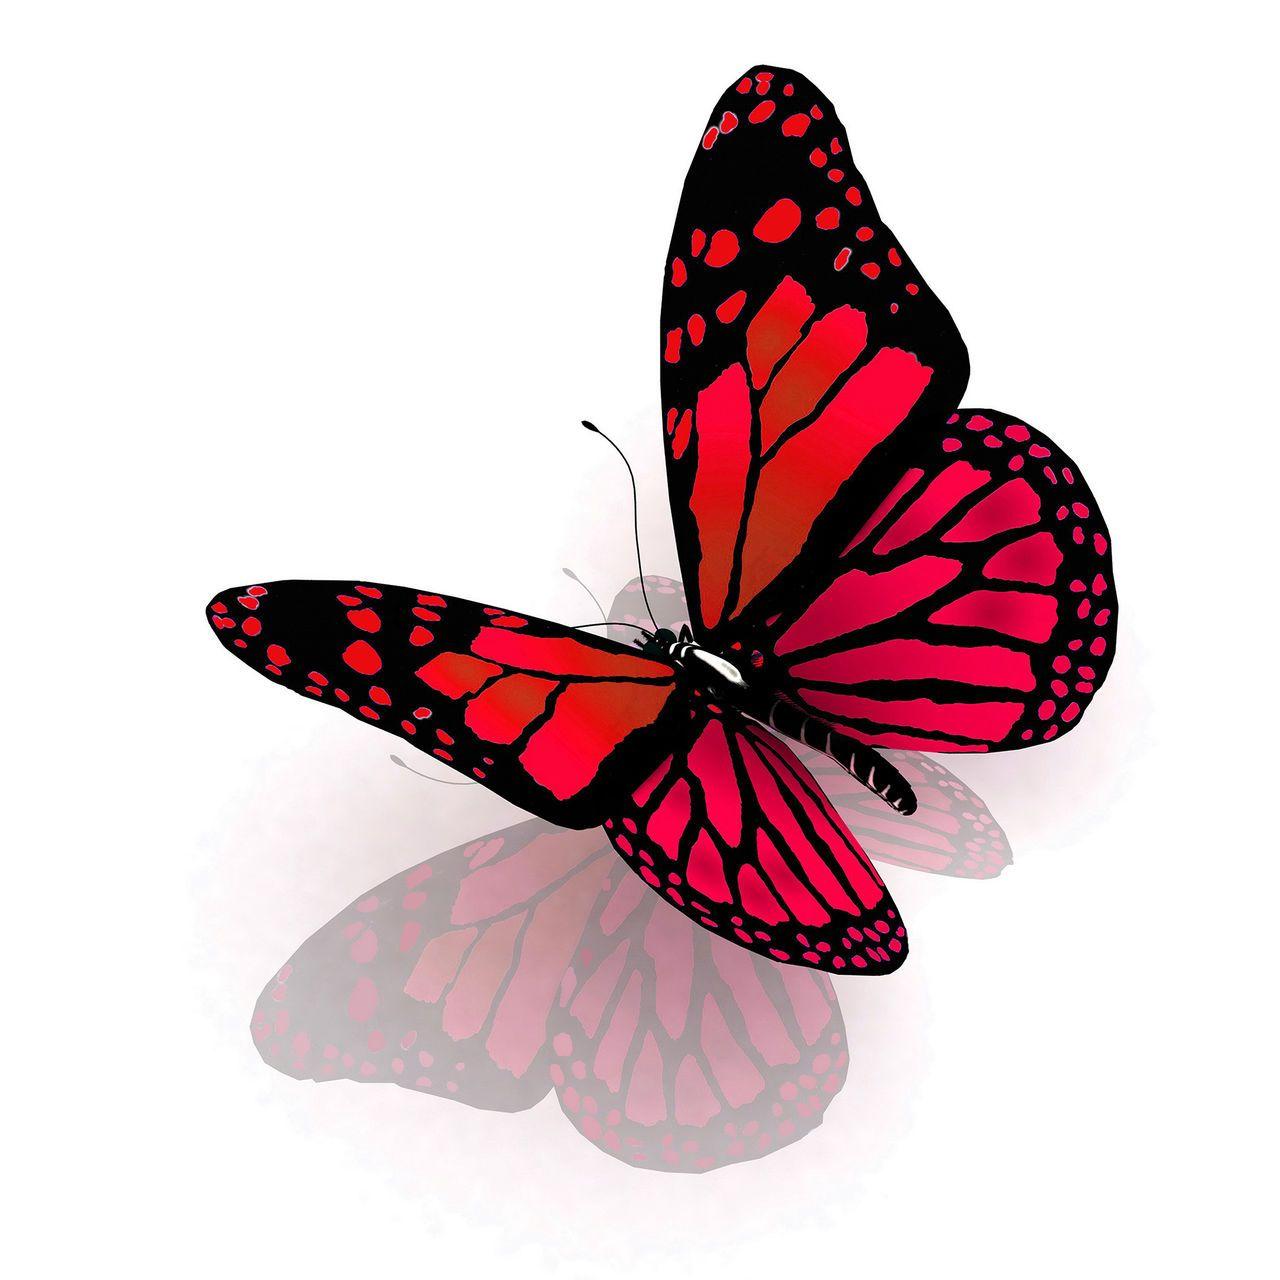 Pin By Edicleia On Babochki Butterflies Butterfly Painting 3d Butterfly Tattoo Butterfly Tattoo [ 1280 x 1280 Pixel ]